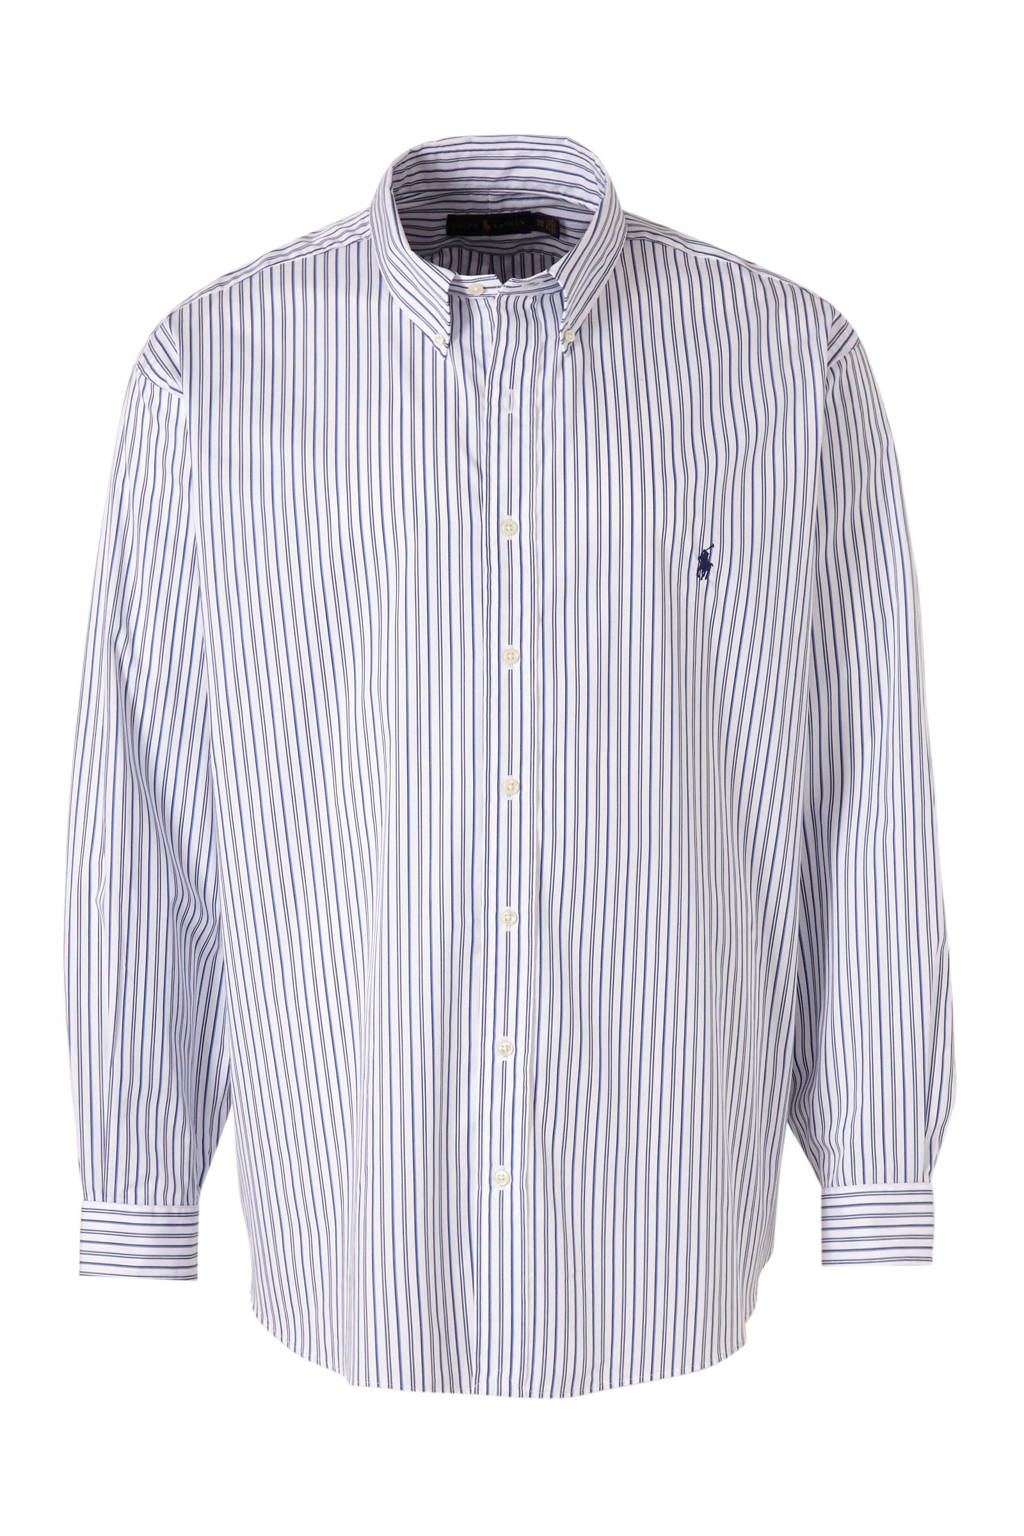 POLO Ralph Lauren Big & Tall +size gestreept regular fit overhemd blauw/wit, Blauw/wit